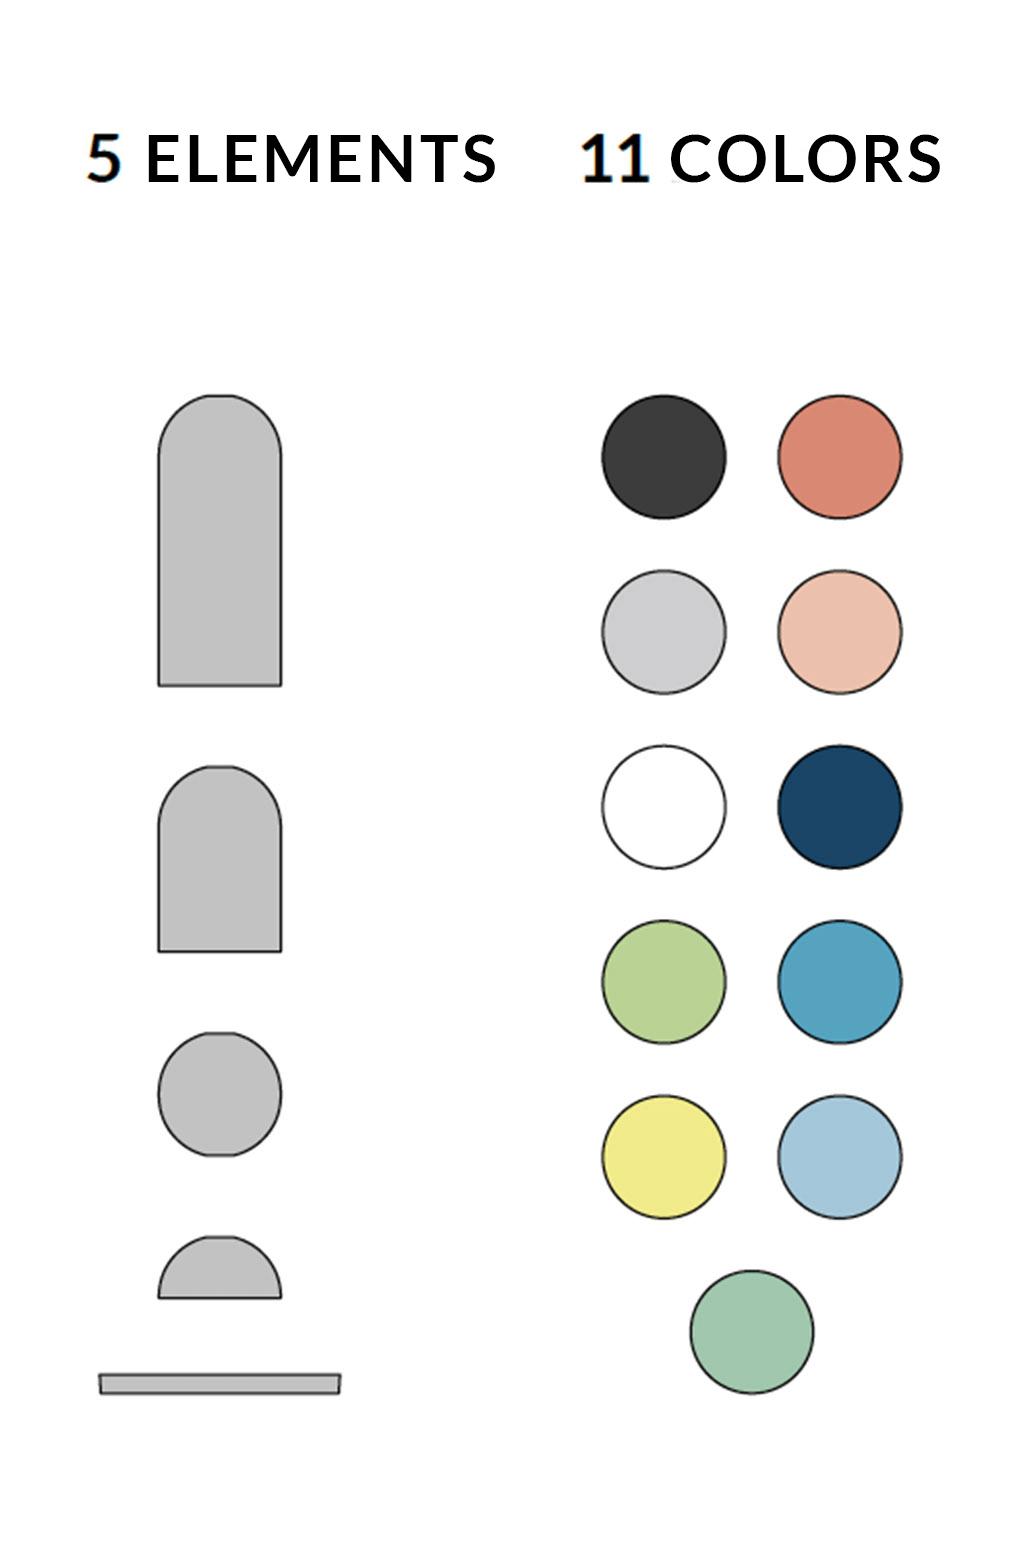 lucyd_neuzeug_elemente_en